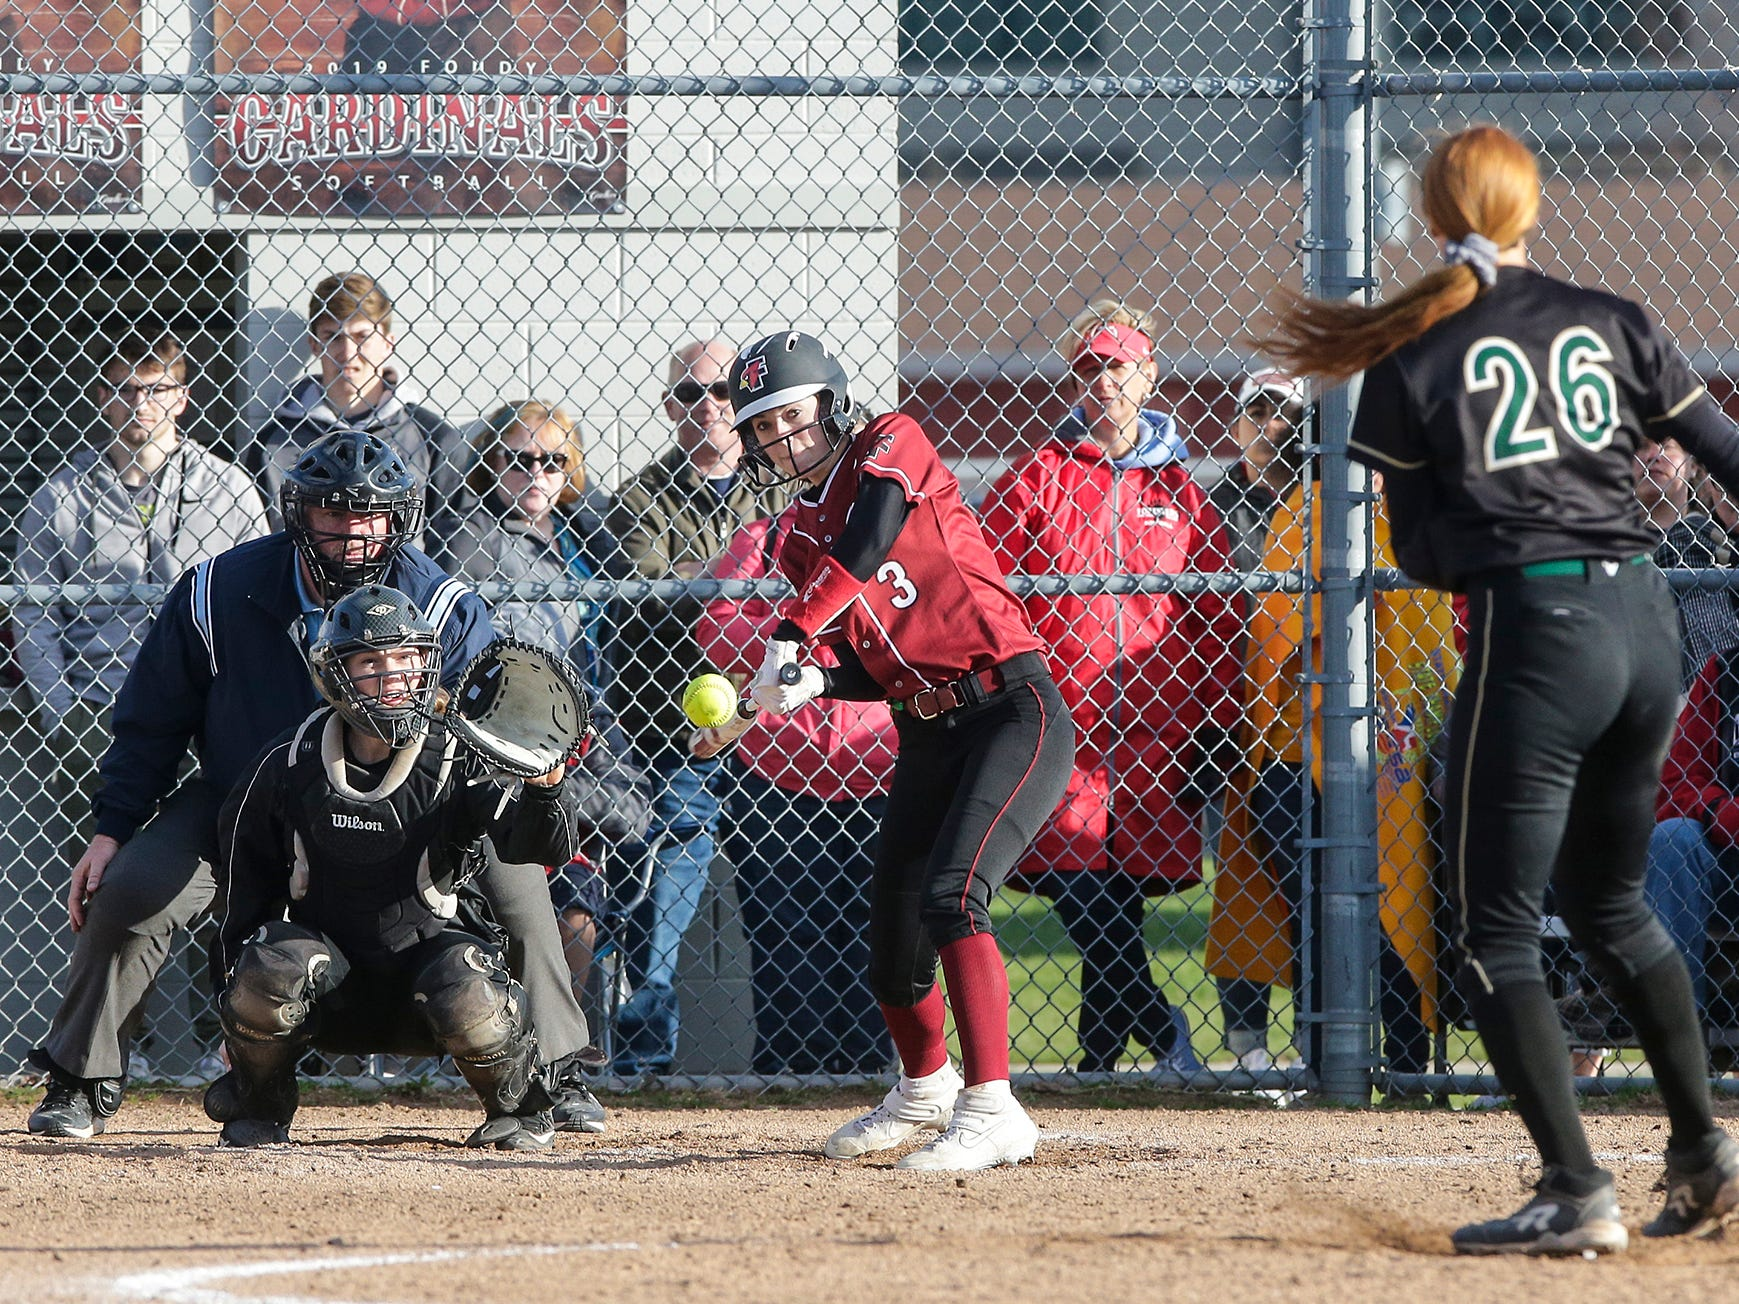 Fond du Lac High School softball's Brianna Biermann swings at a pitch against Oshkosh North High School during their game Friday, April 26, 2019 in Fond du Lac, Wis. Doug Raflik/USA TODAY NETWORK-Wisconsin